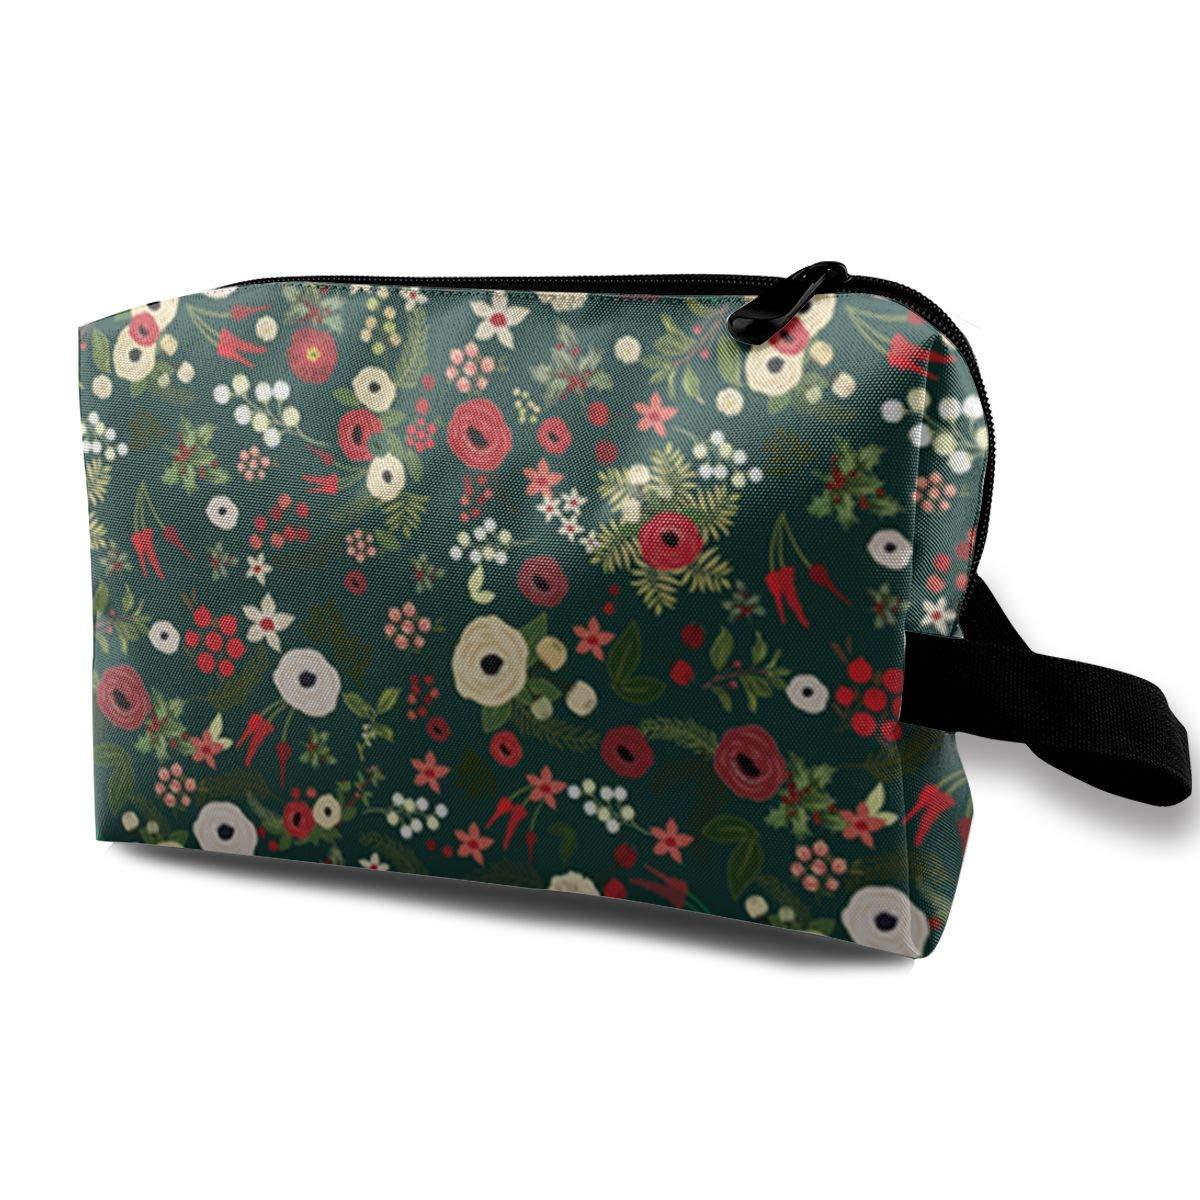 d17af1799825 Amazon.com: Vintage Christmas Floral Toiletry Bag Multifunction ...